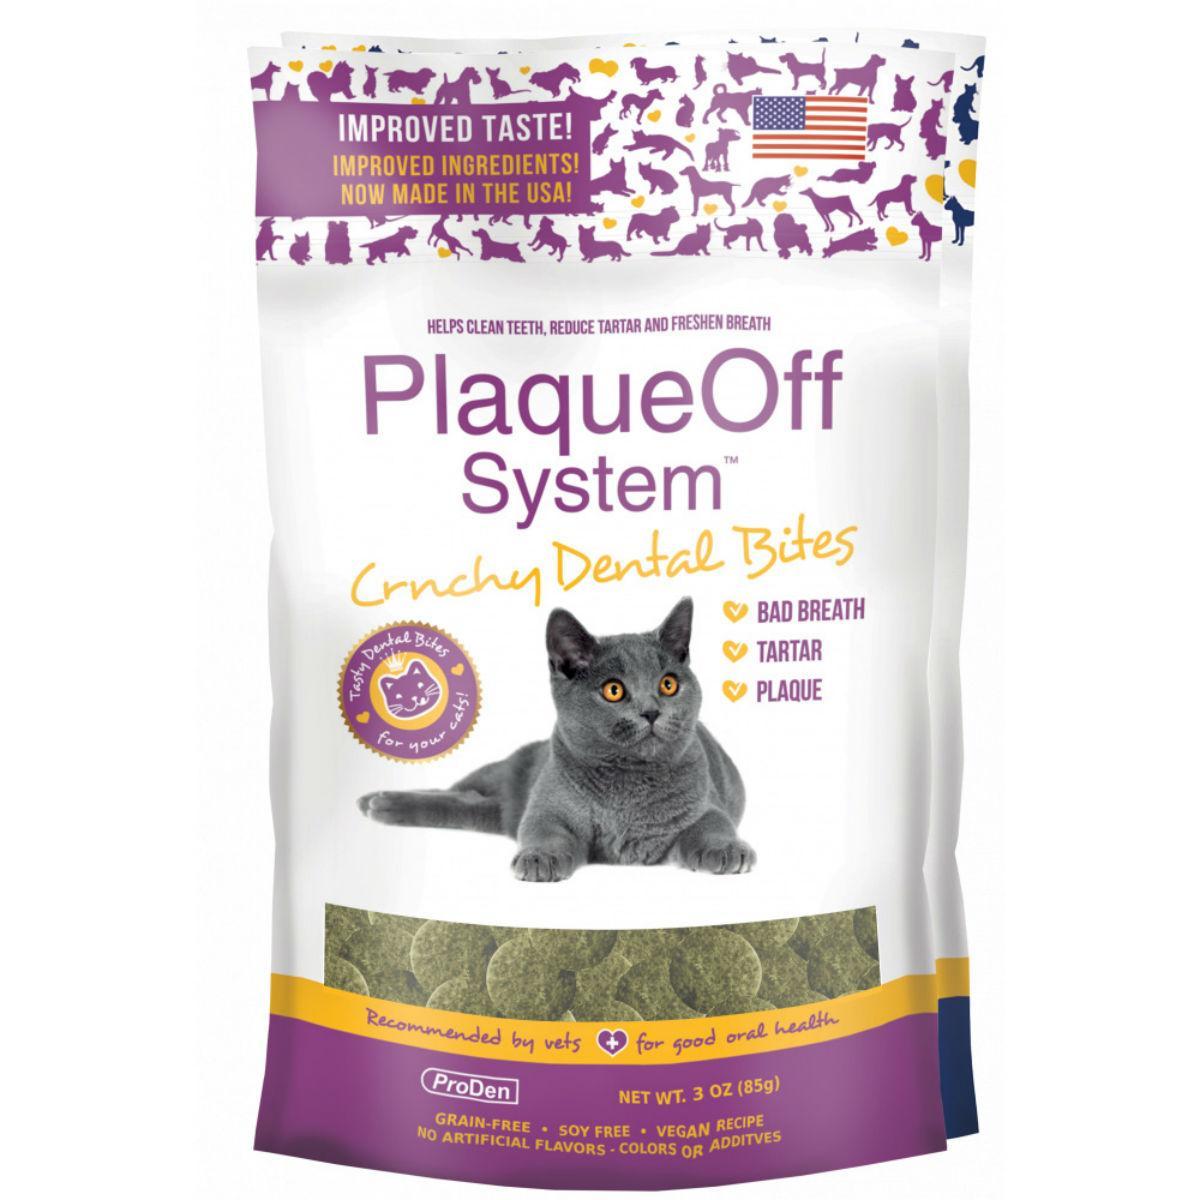 ProDen PlaqueOff Crunchy Dental Bites Cat Treat